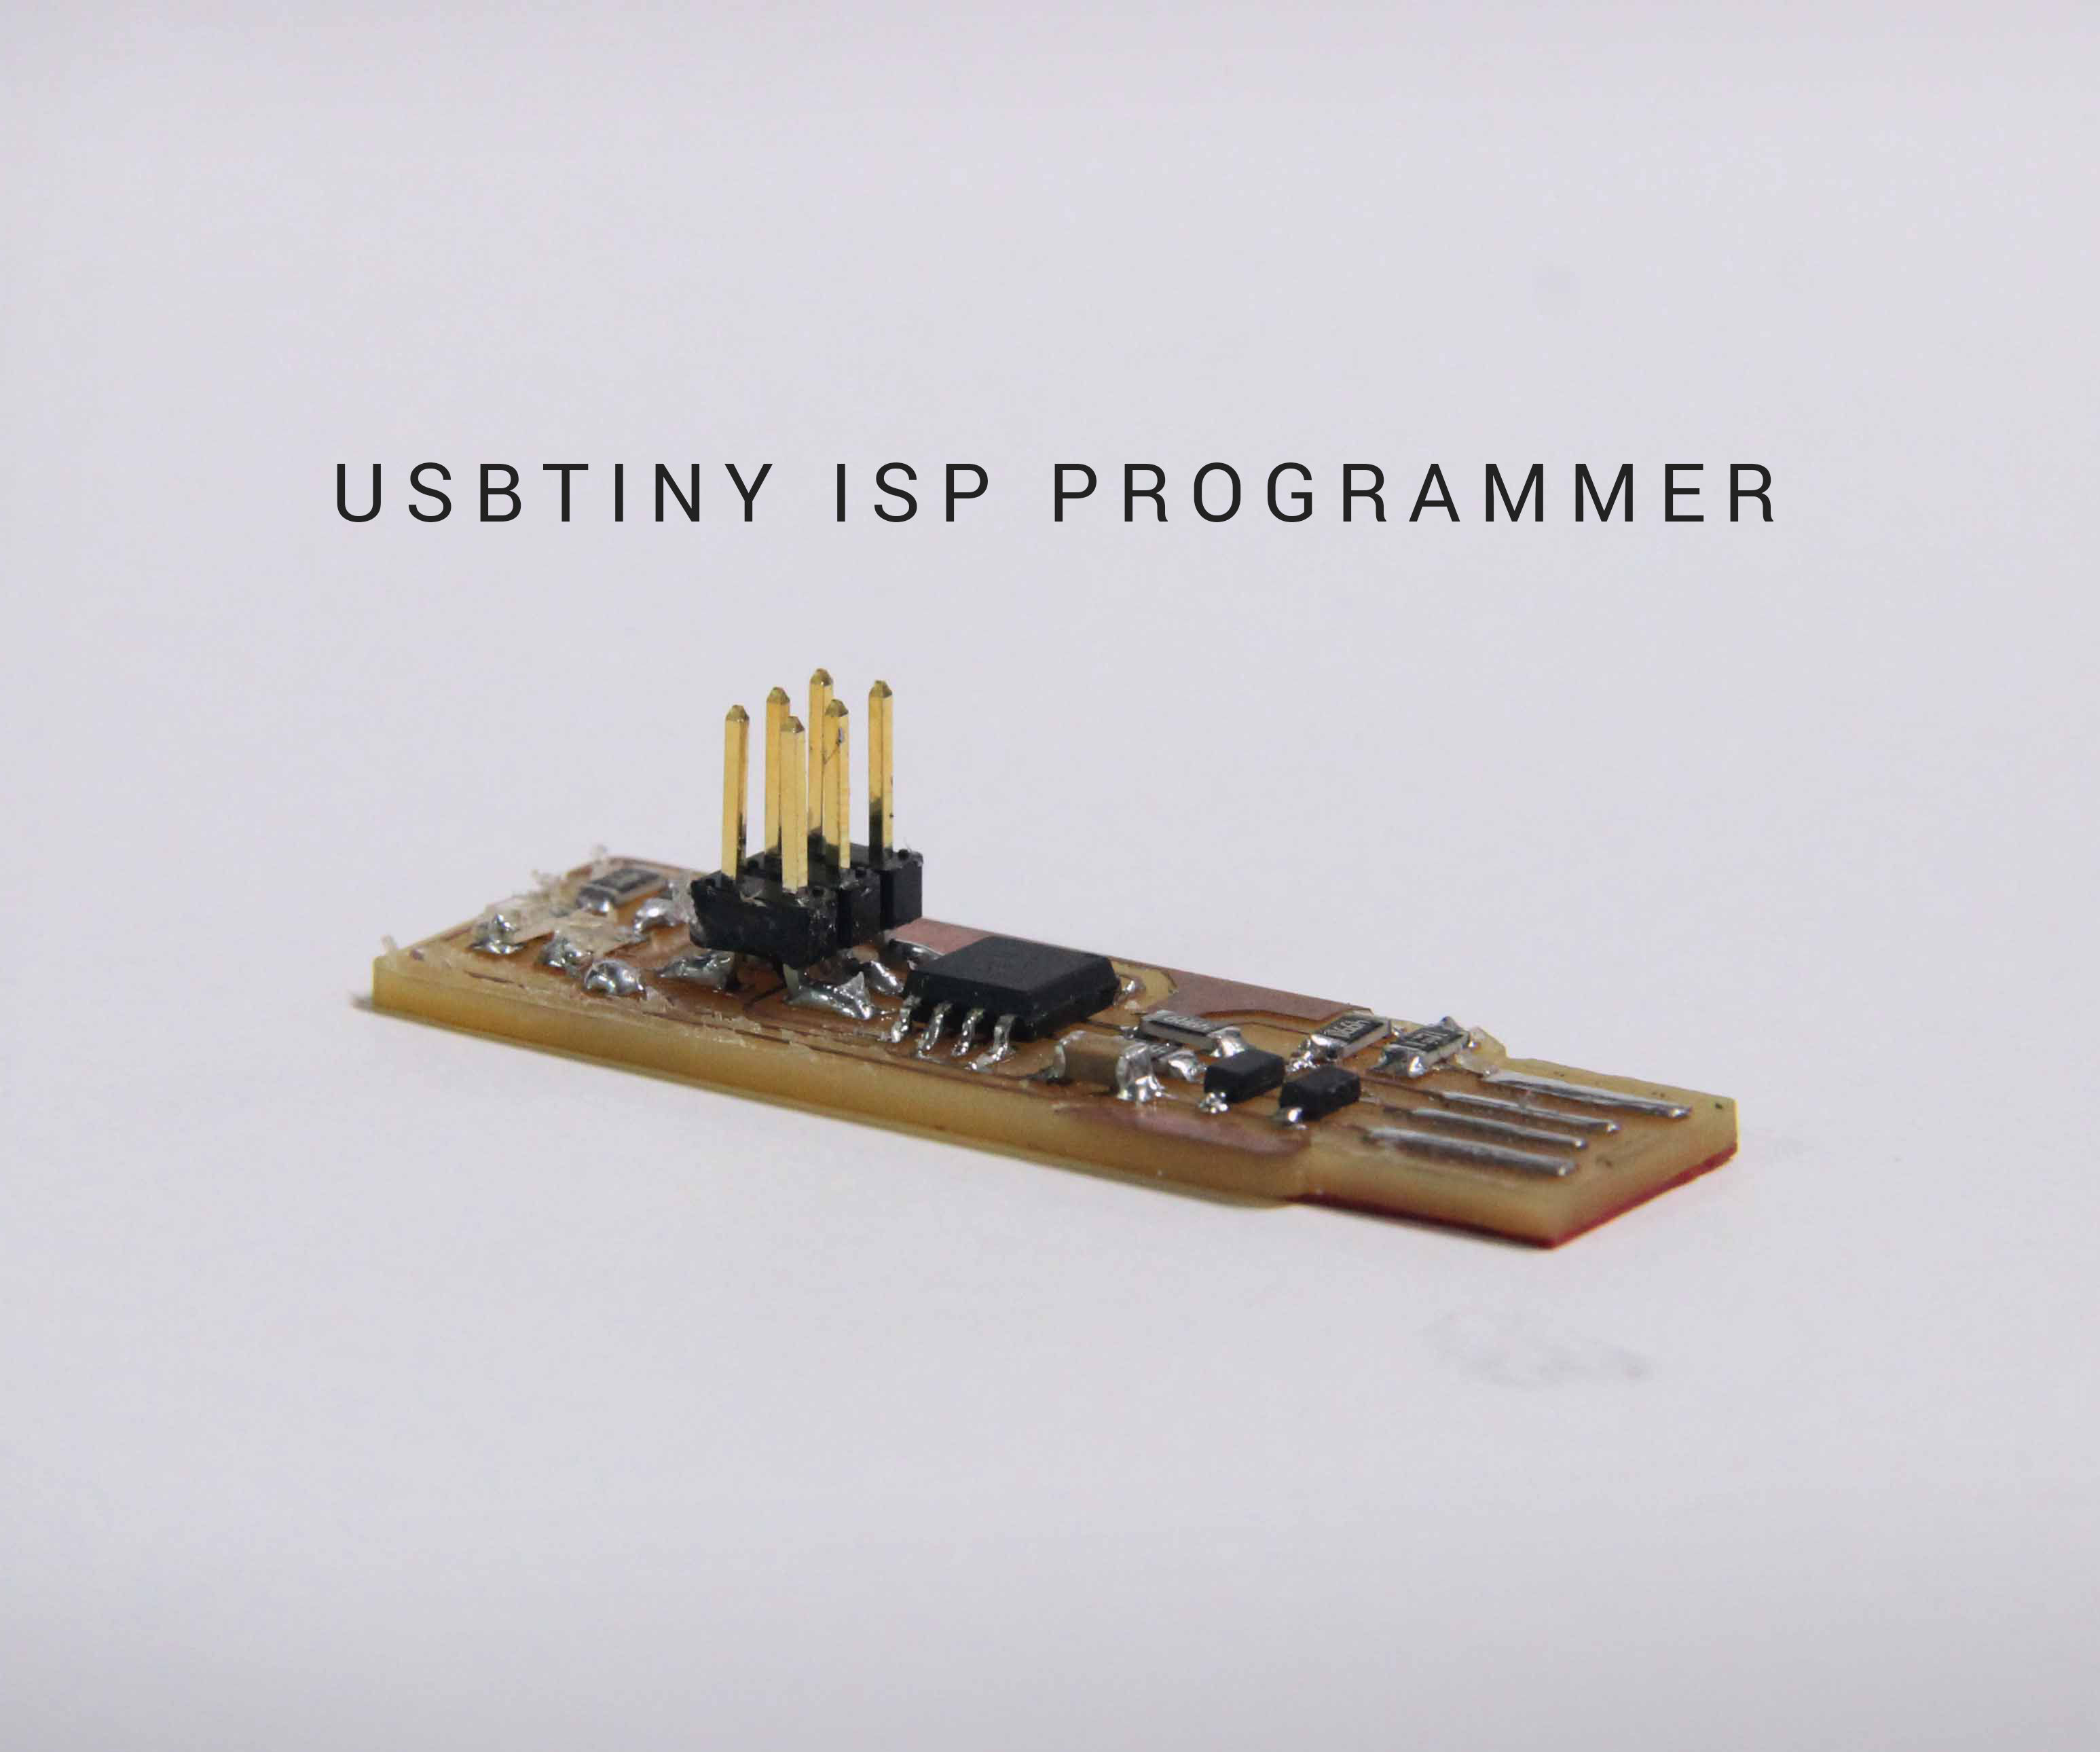 Build a USBTINY ISP Programmer